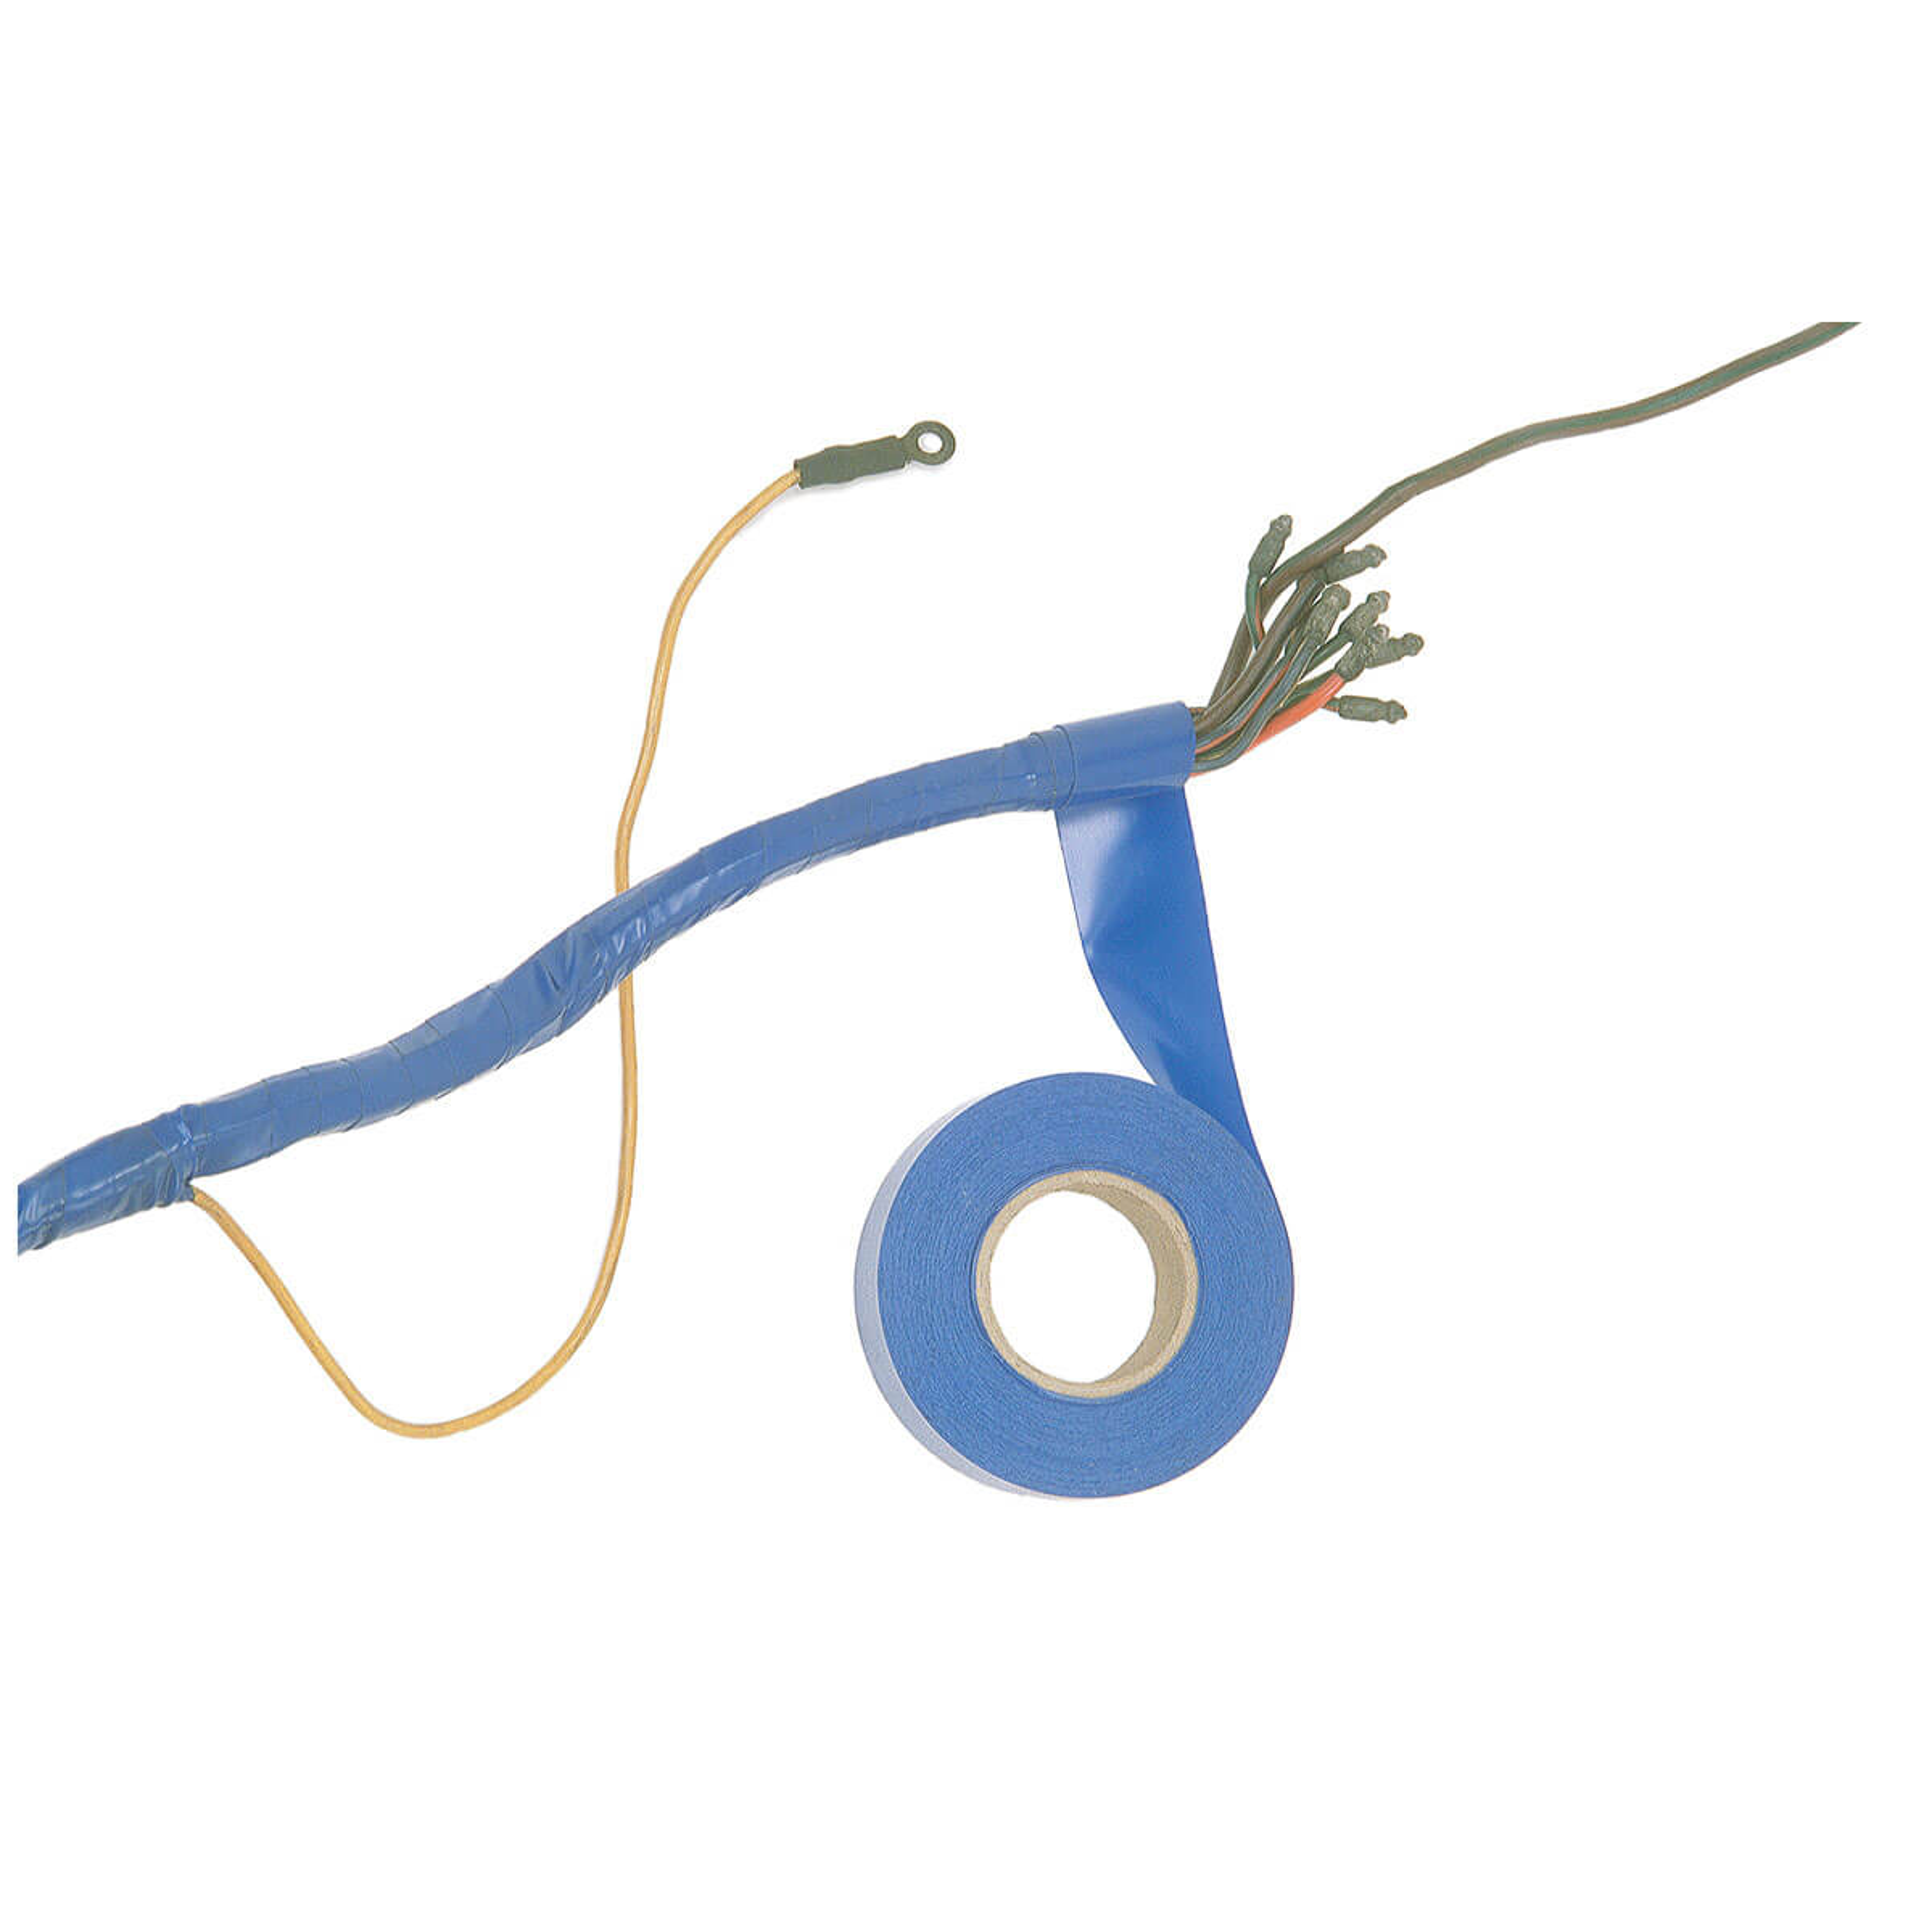 357 130 Wiring Harness Lacquer Braid Moss Motors 1954 Jaguar Xk120 Diagram Tape Blue